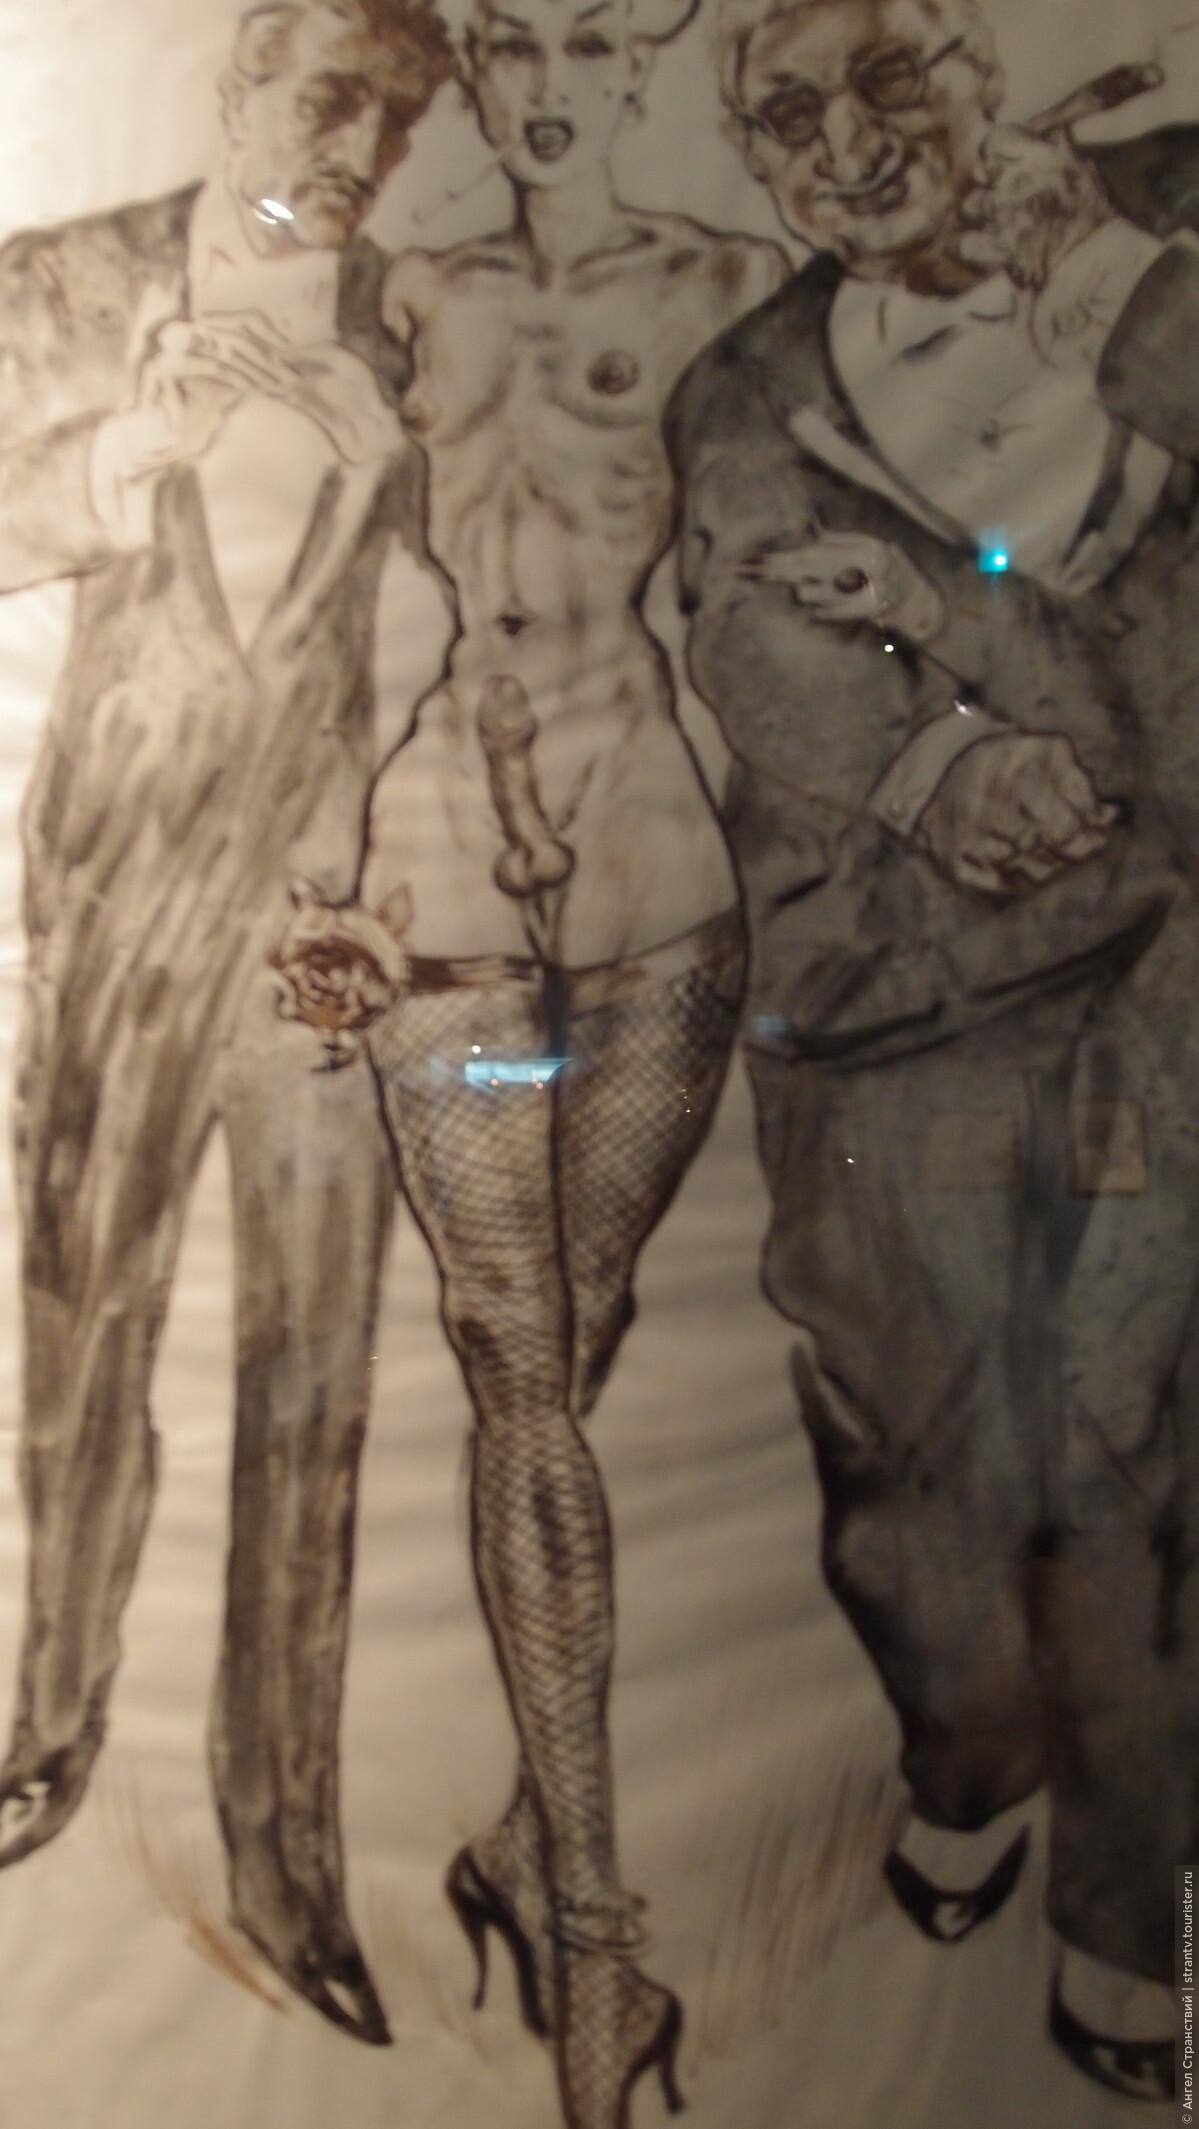 Музей эротики берлин